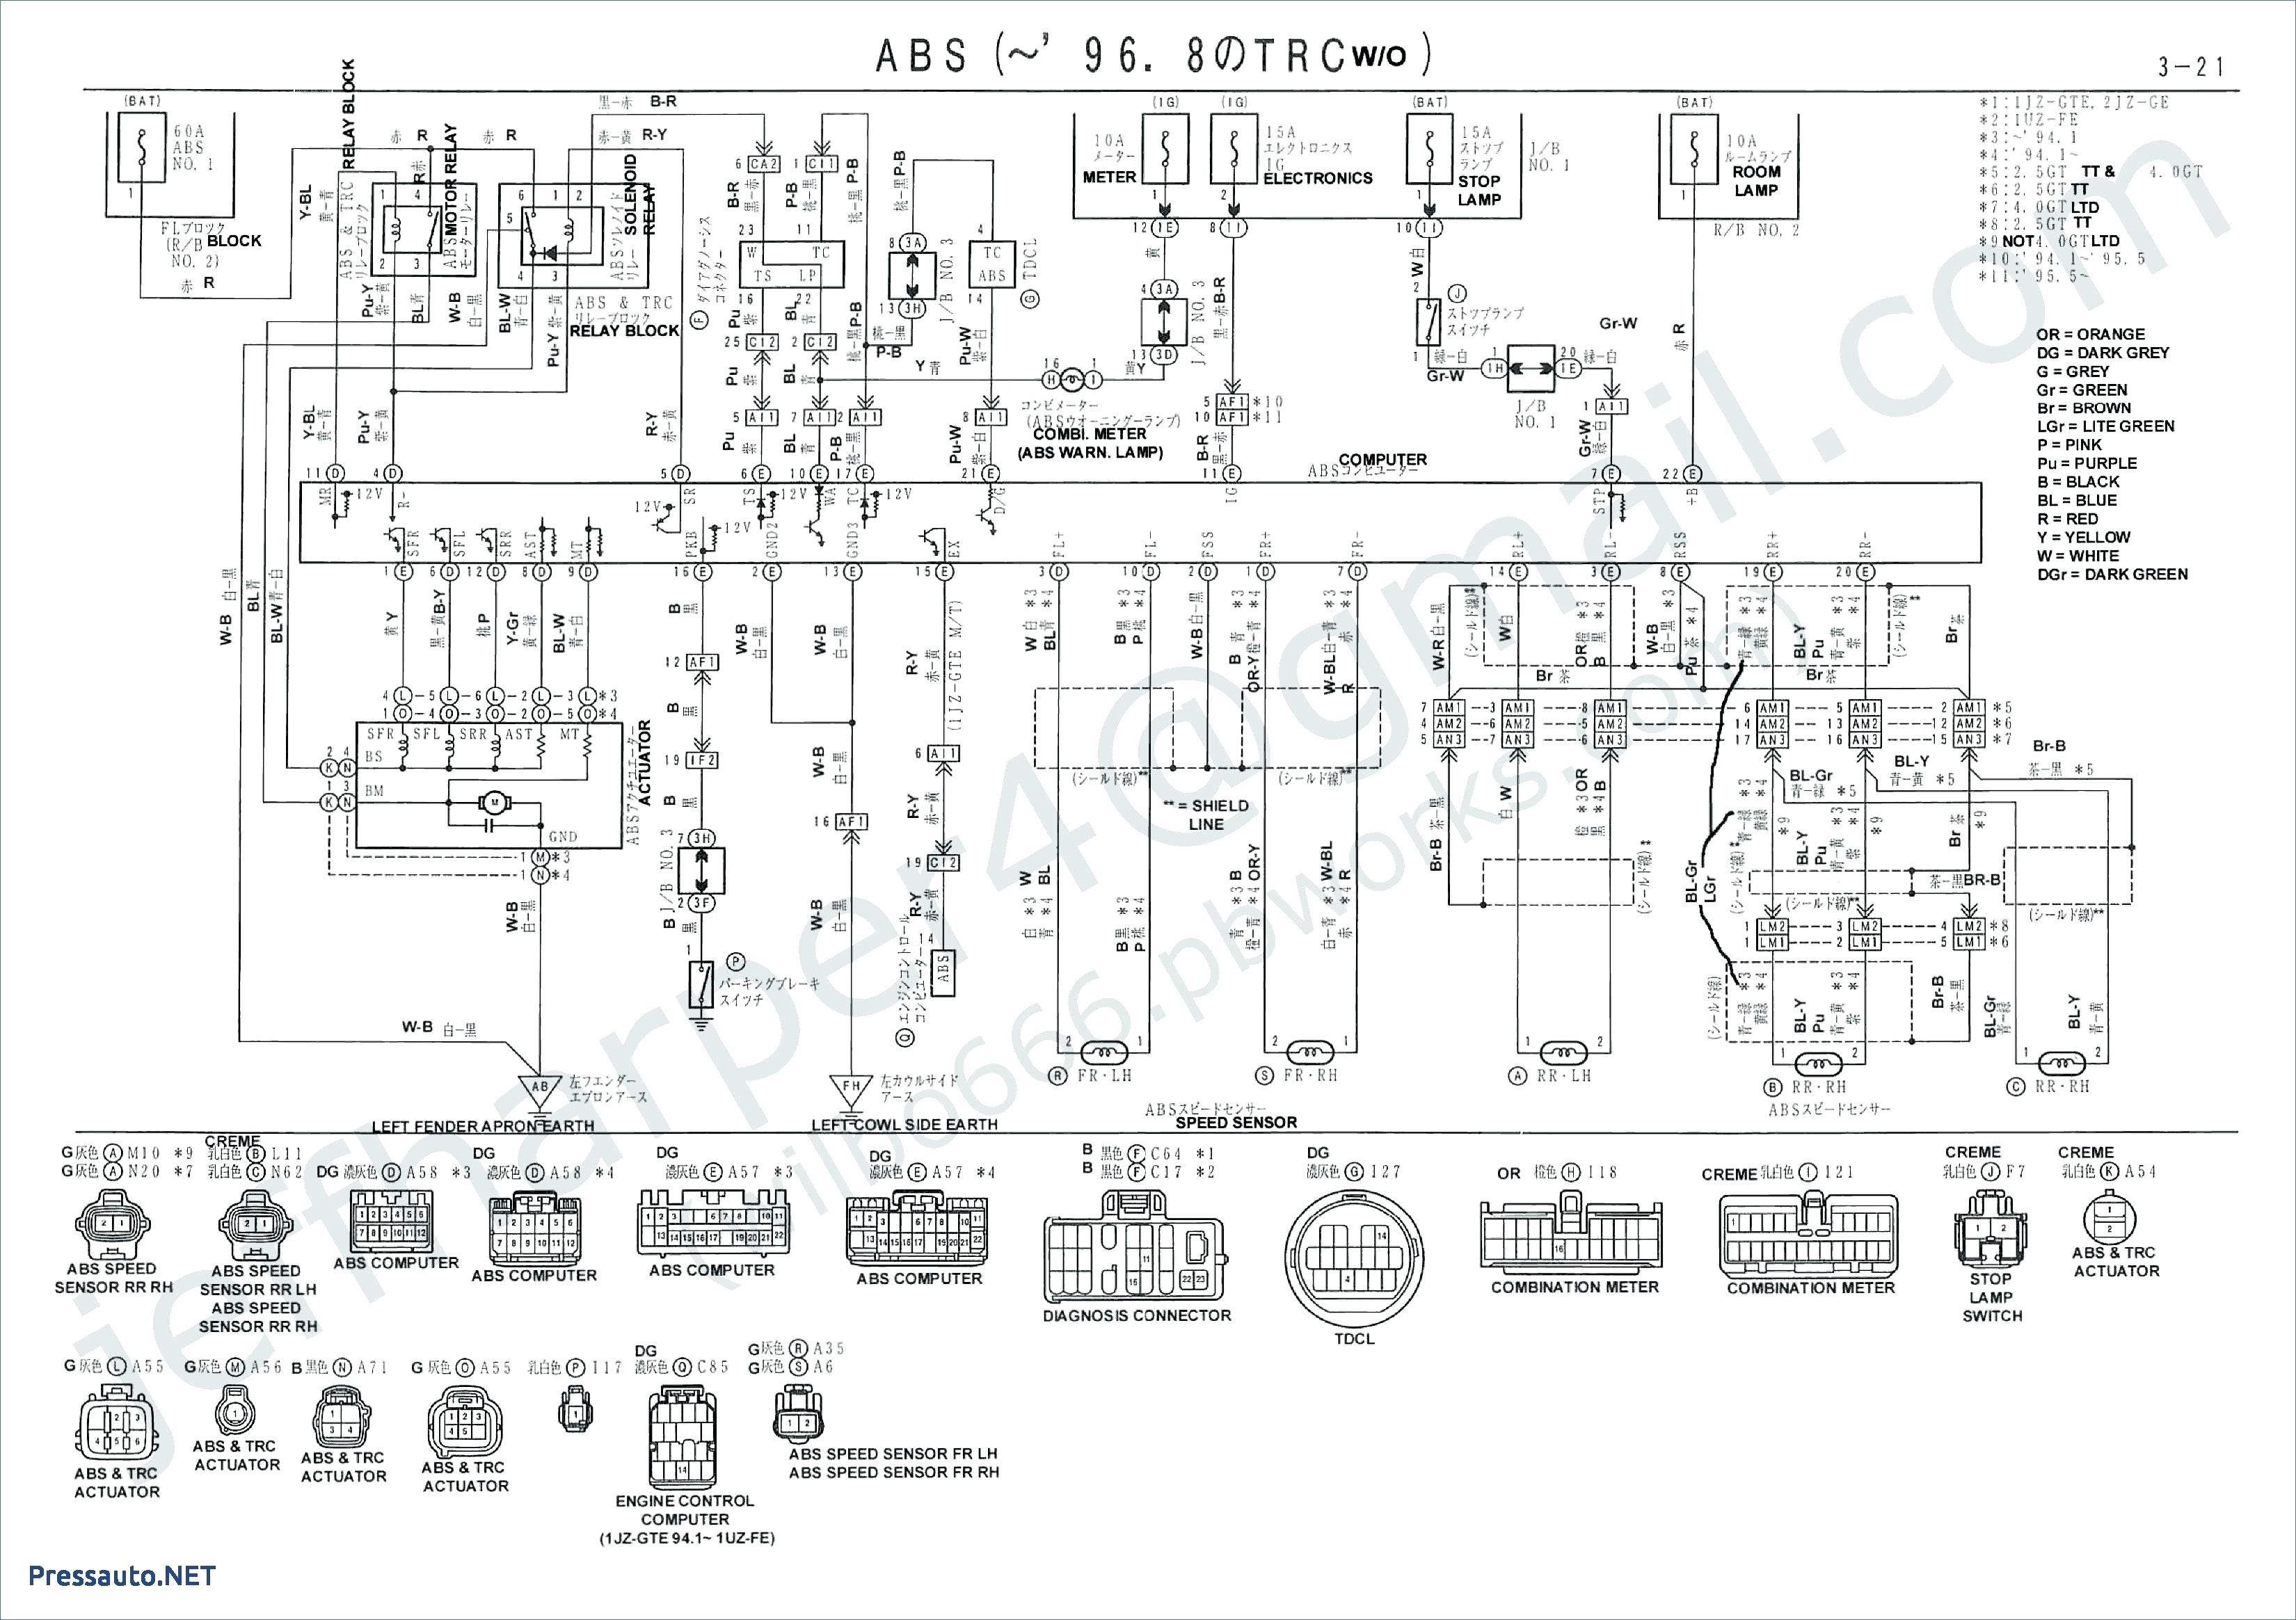 2005 dodge stratus wiring diagram 2001 chevy cavalier engine 2 din diagrams